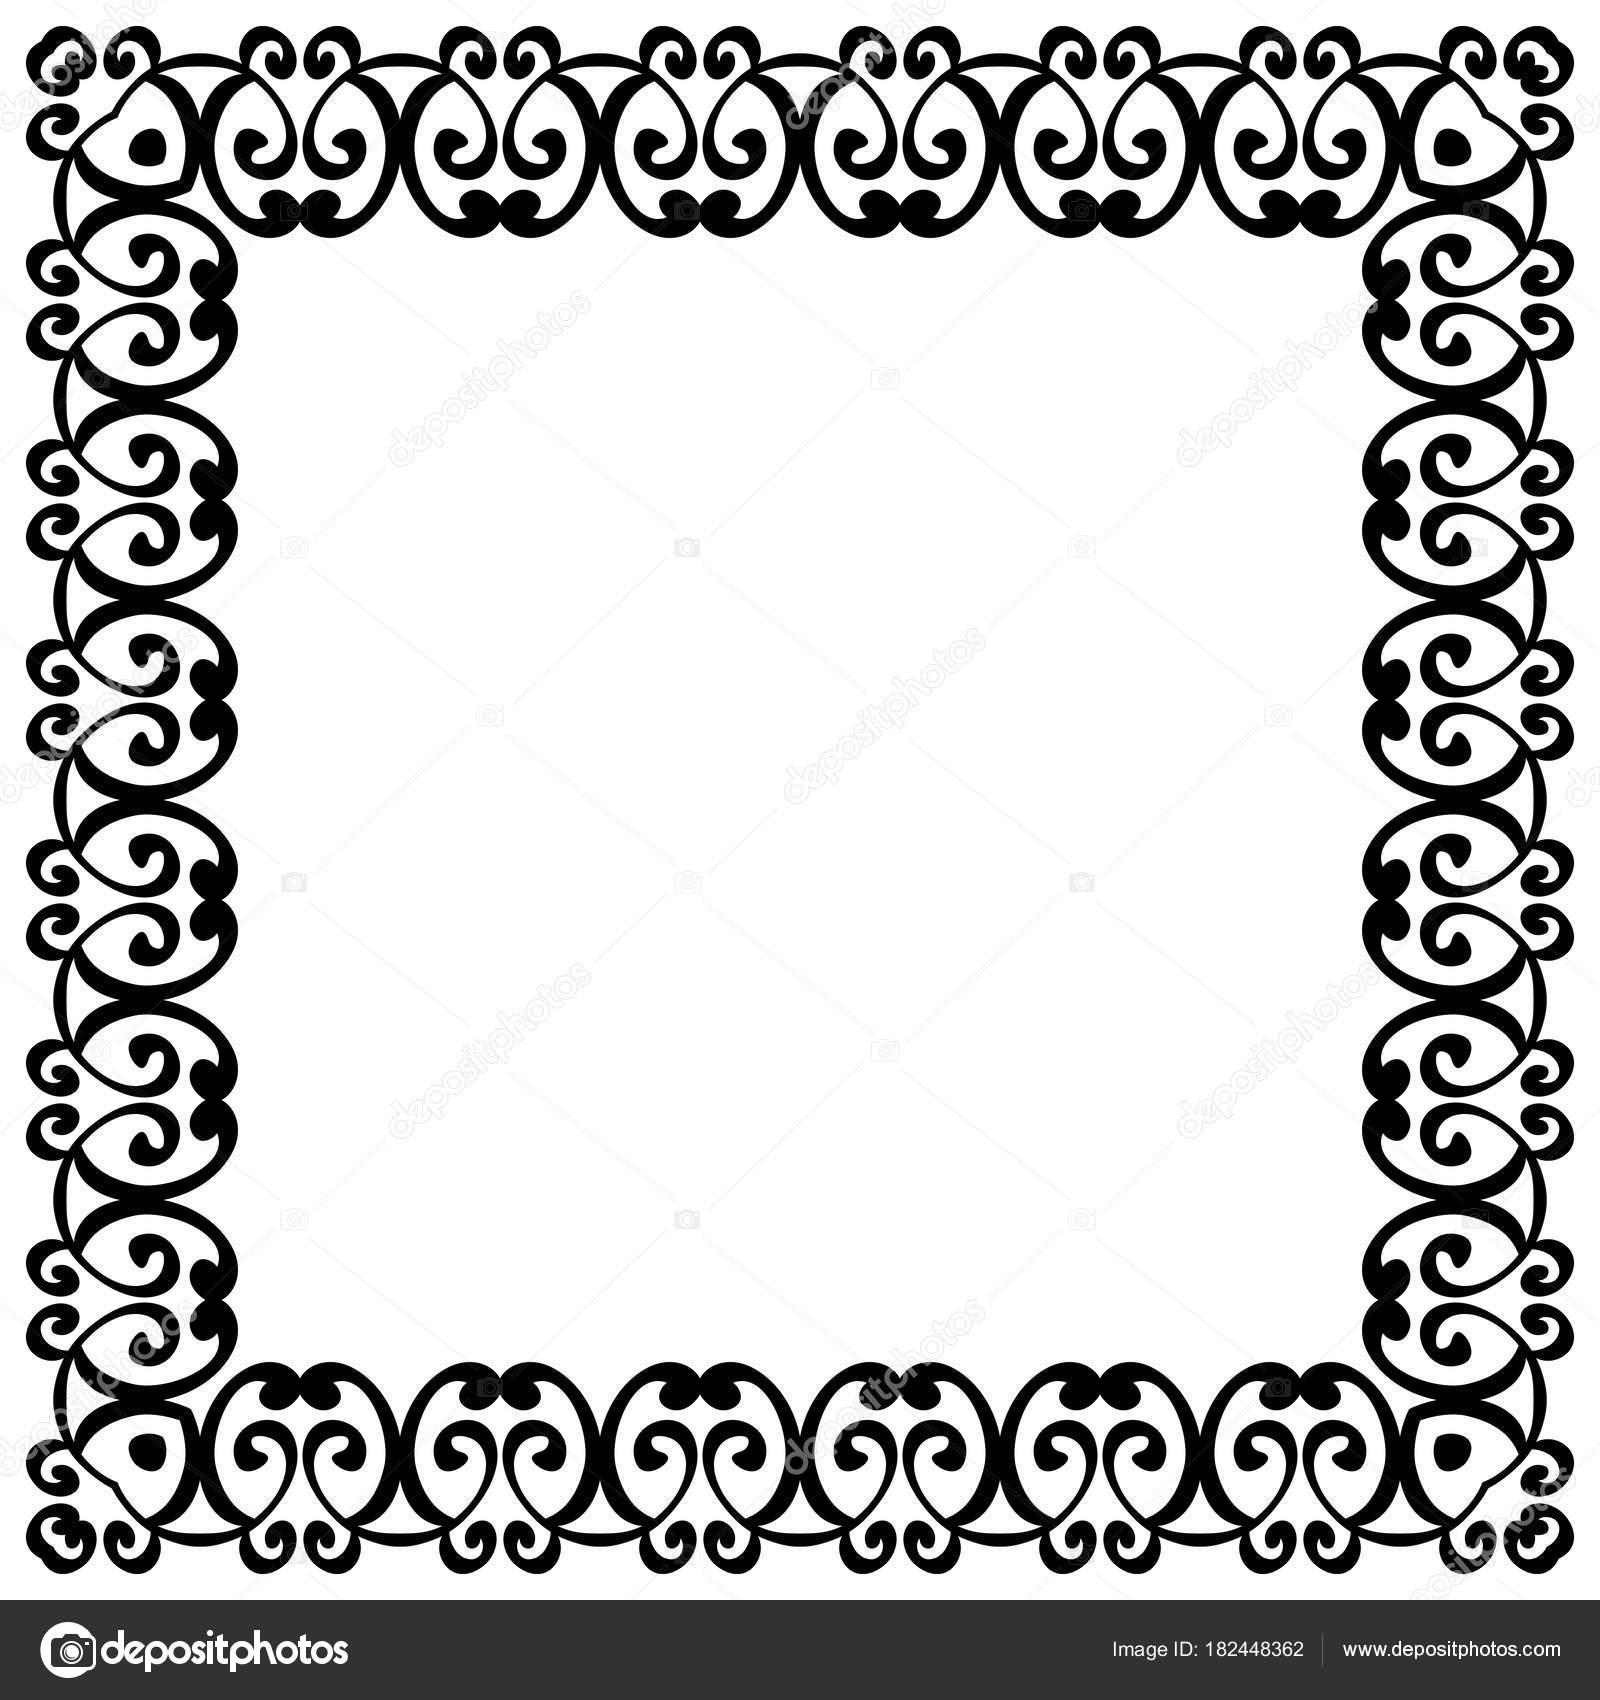 border vector vintage pattern decorative retro frame stock vector rh depositphotos com decorative border vector png decorative border vector brushes